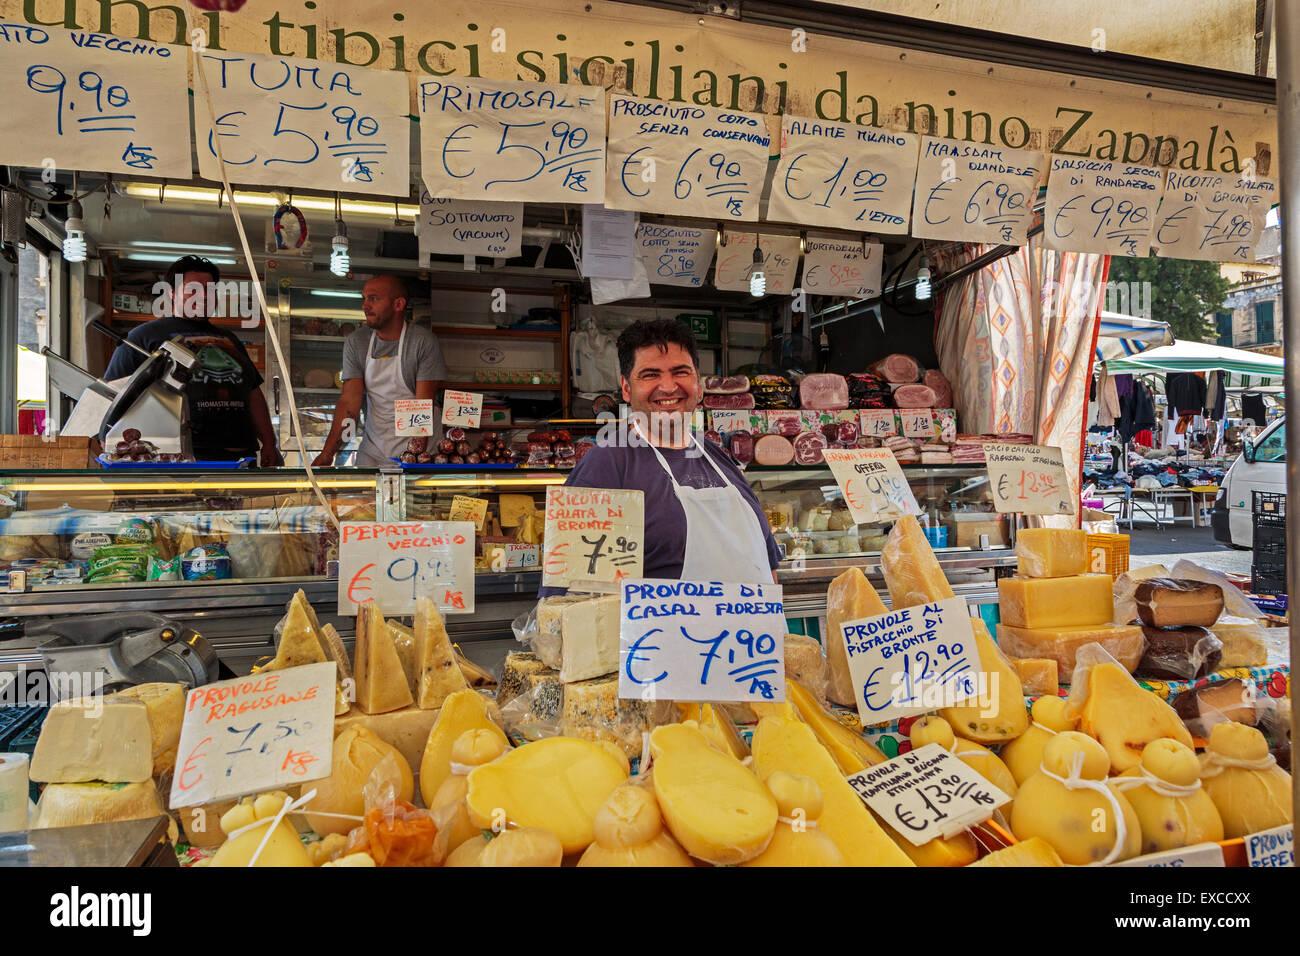 Cheese seller at Catania street market, Catania town, Sicily, Italy Stock Photo